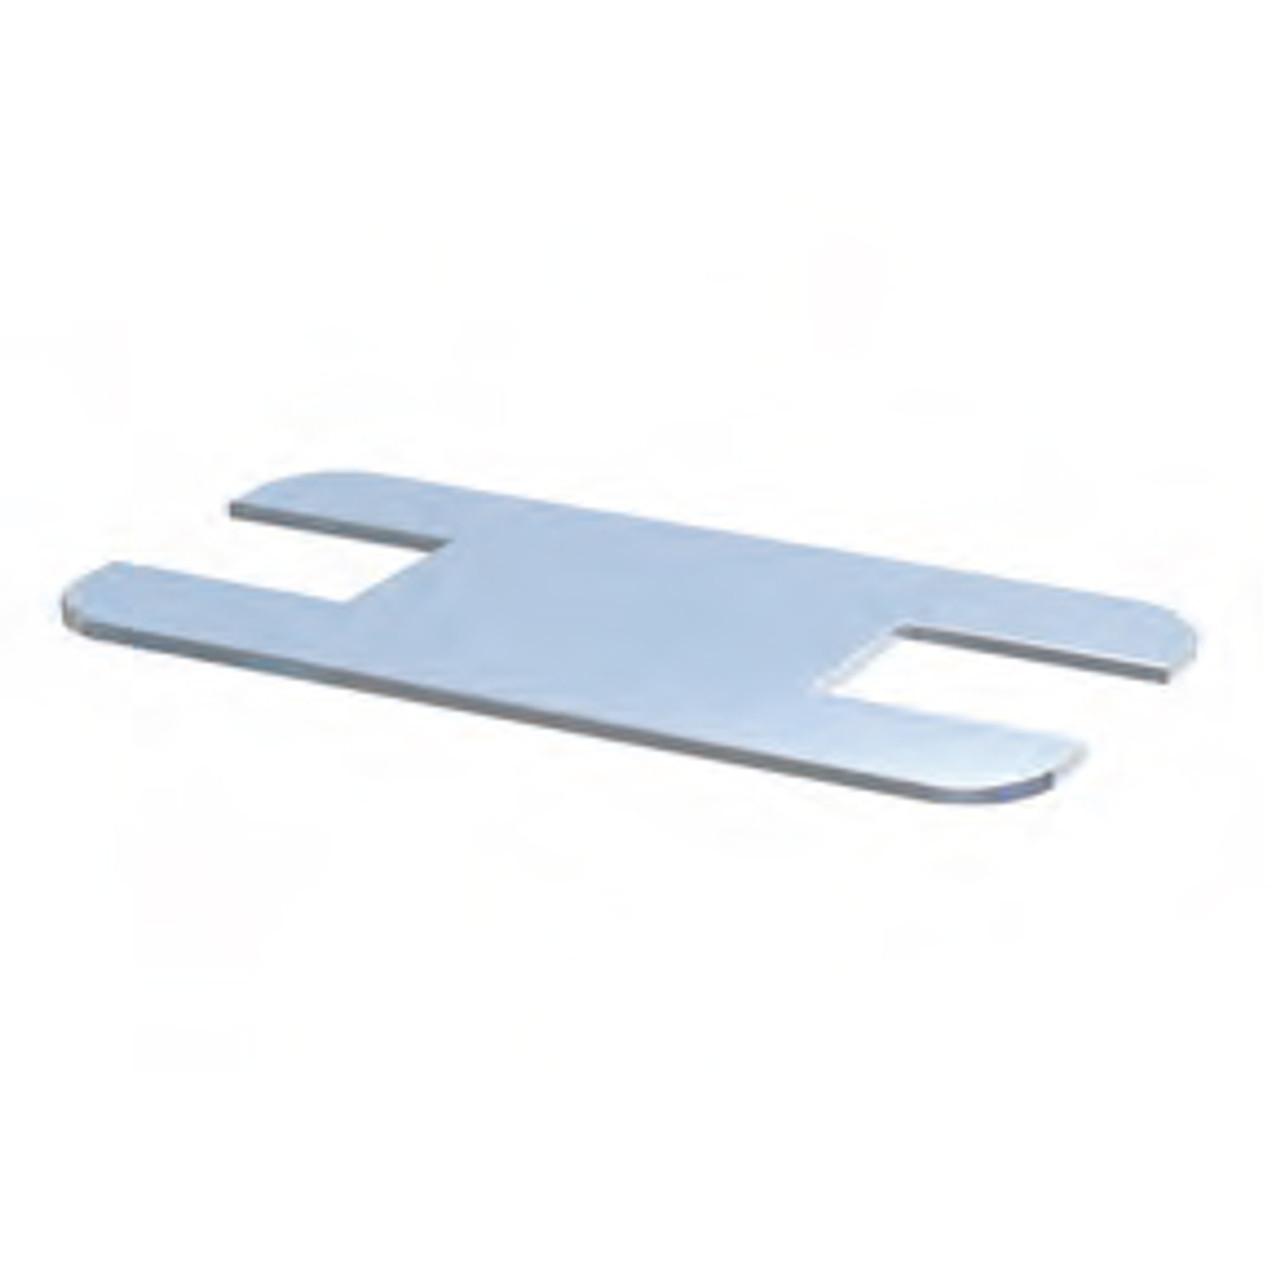 LP7316 Locking Plate